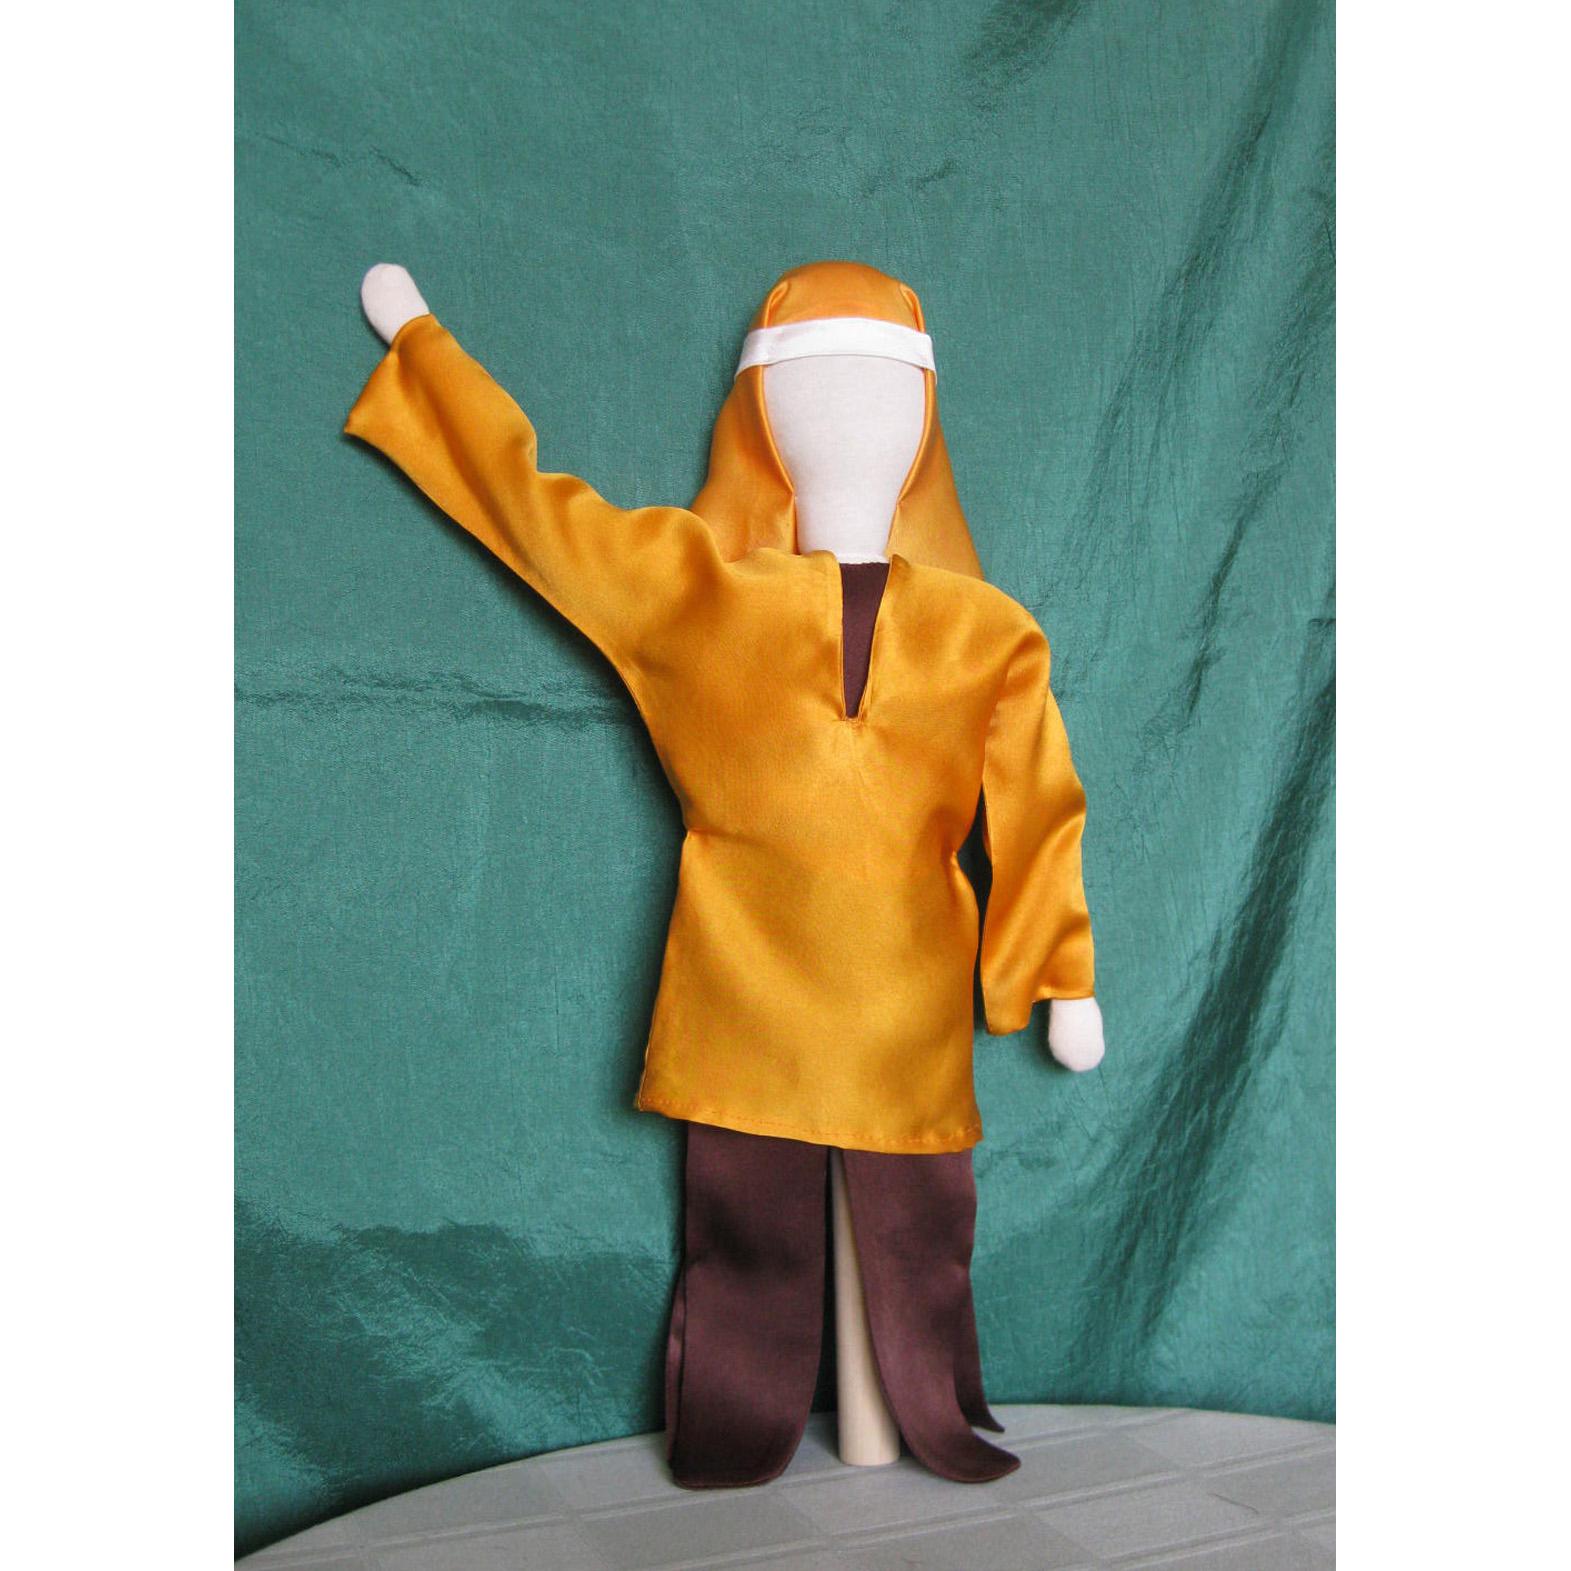 earthly-adam-puppet-1.JPG